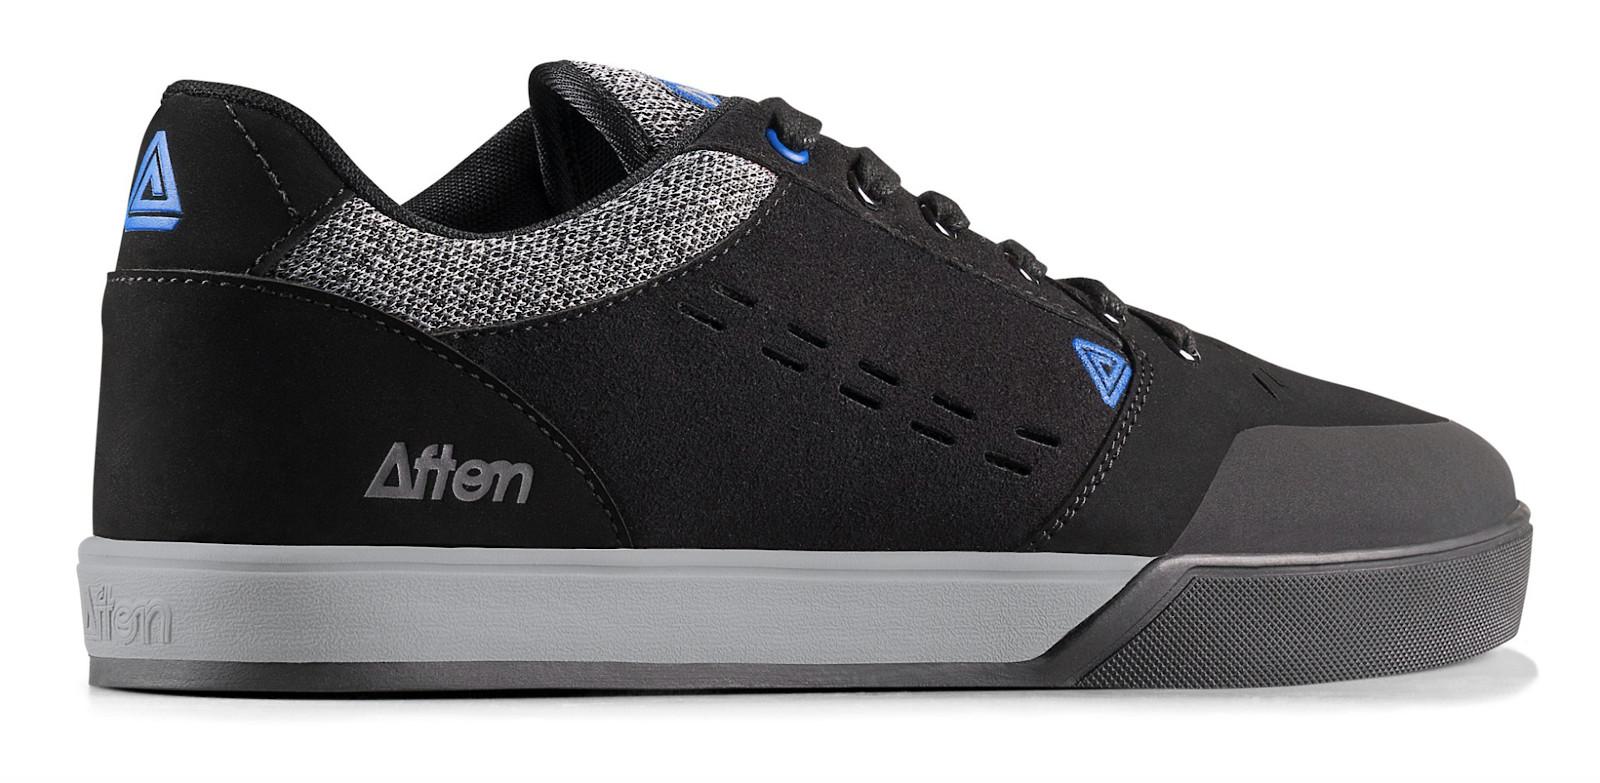 Keegan Black/Blue $99.99 - Afton Shoes - Mountain Biking Pictures - Vital MTB